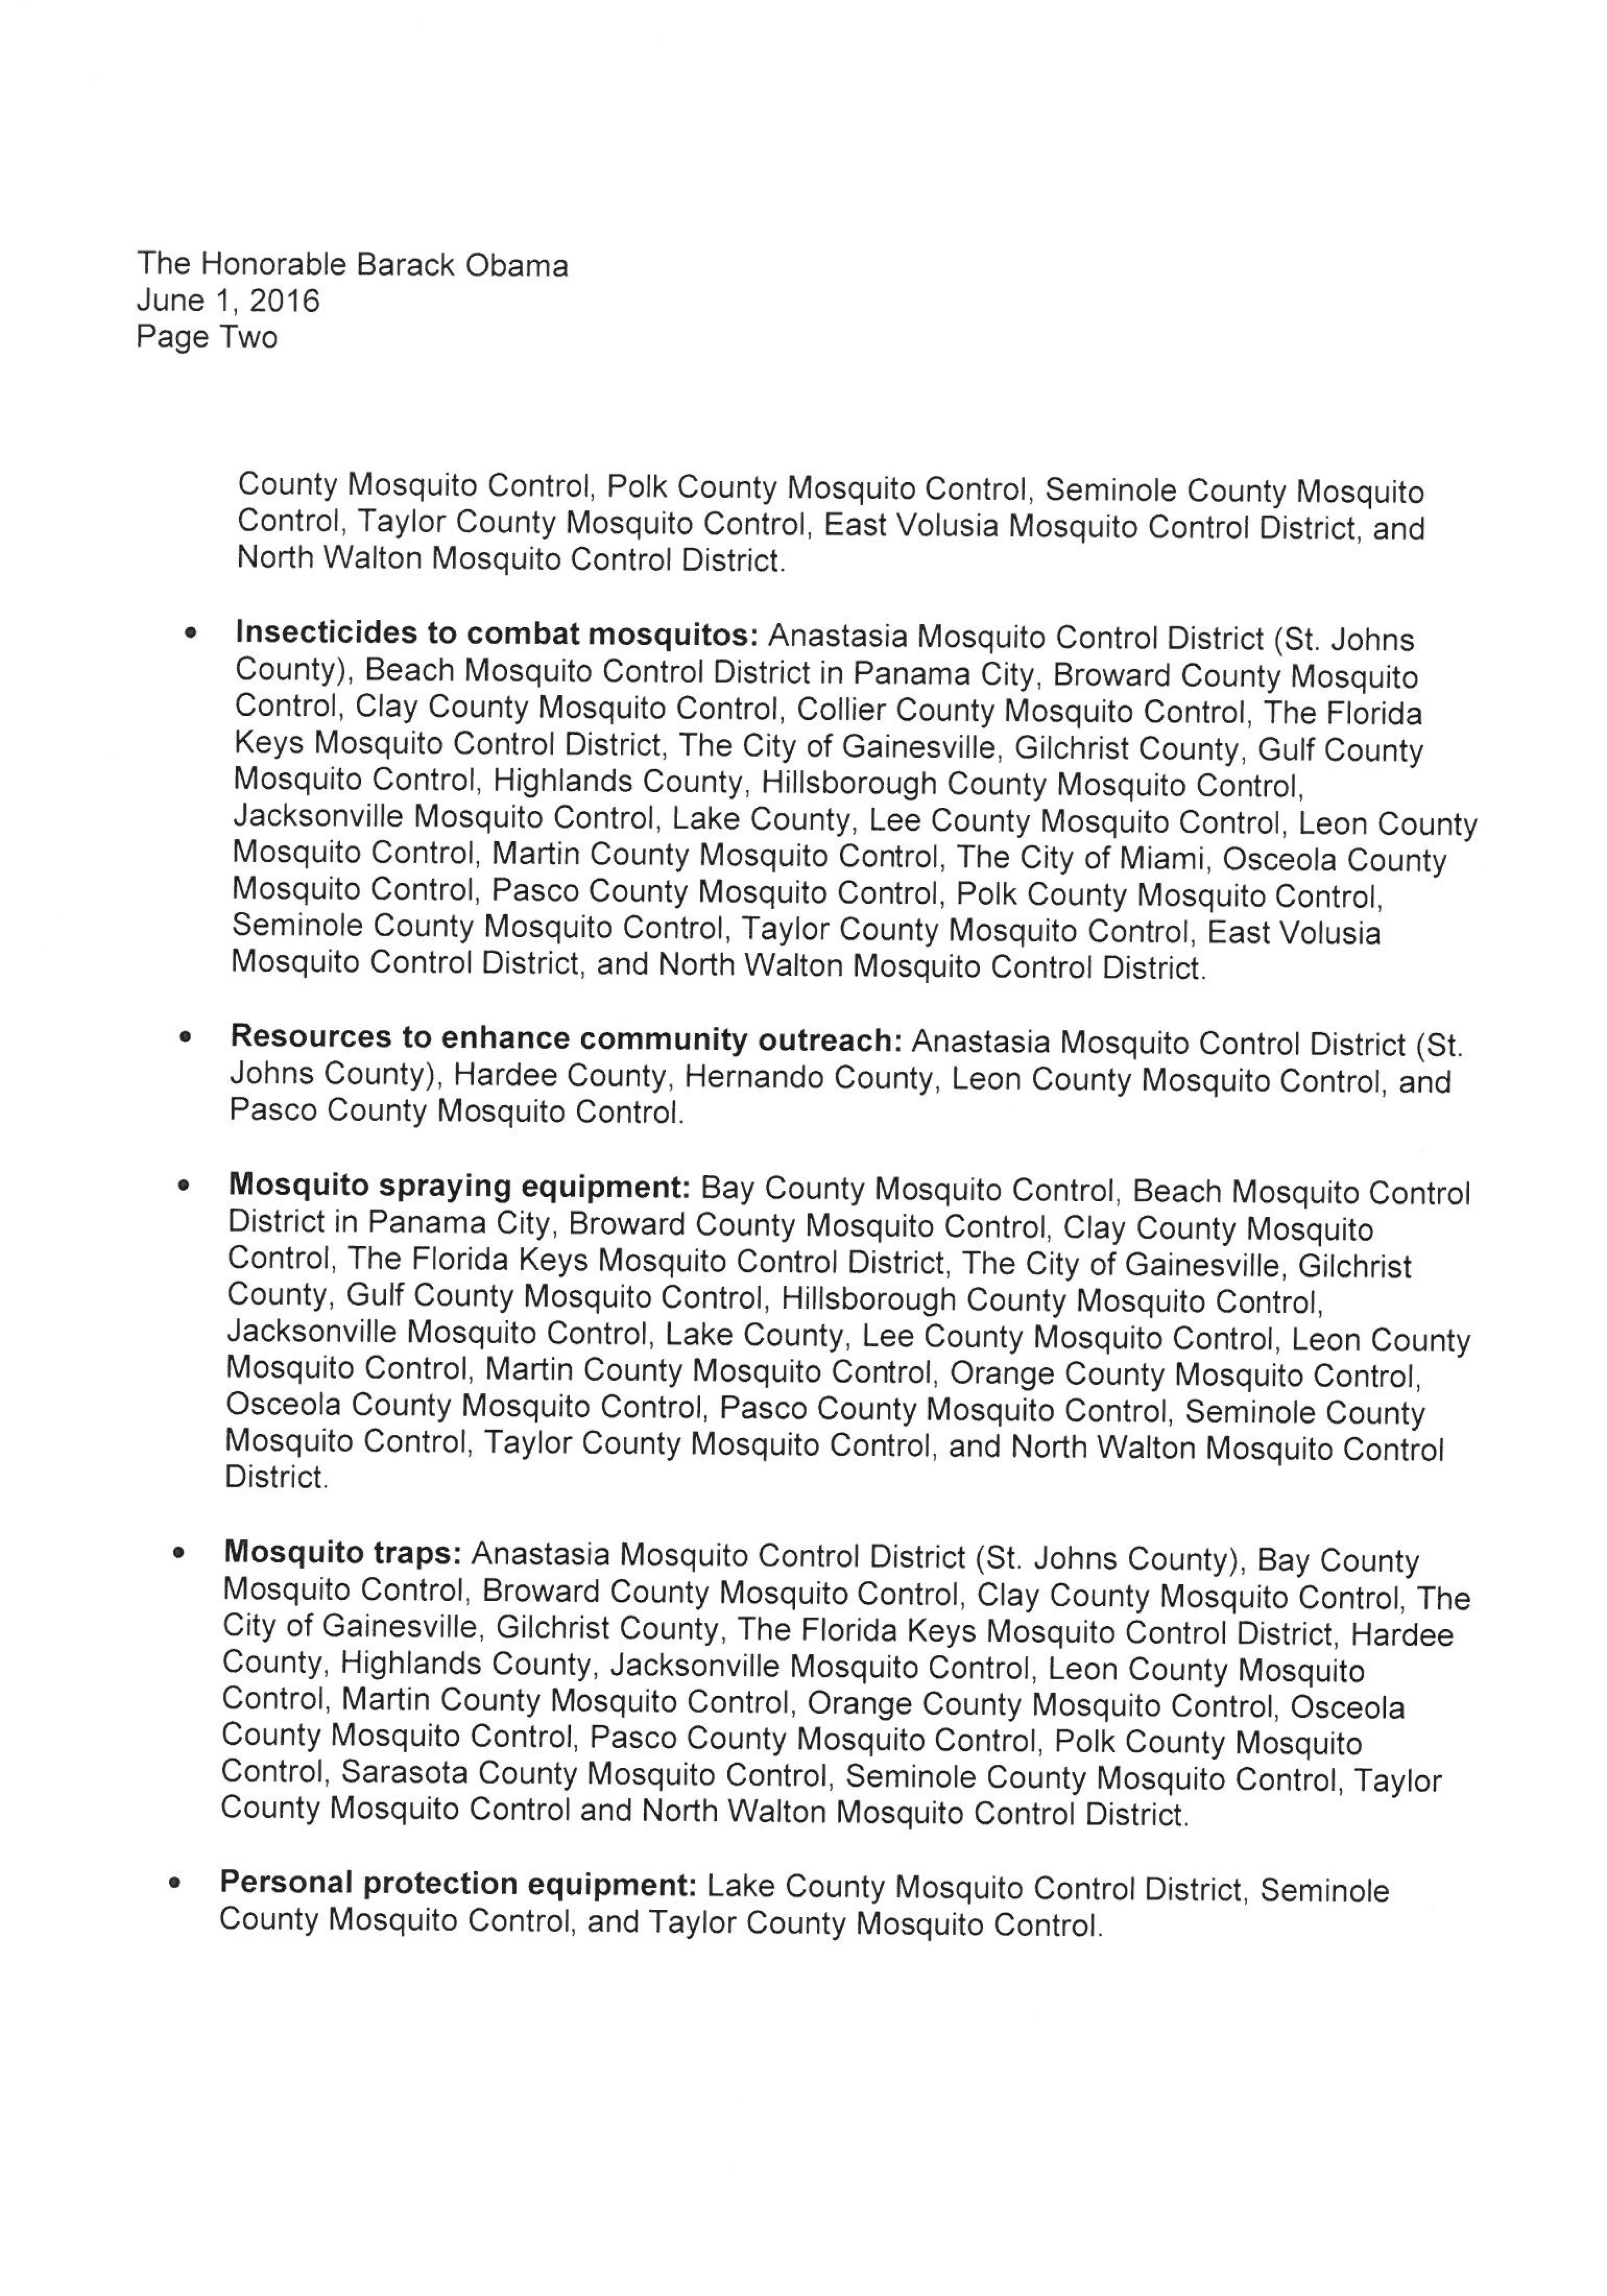 scott zika letter_Page_2